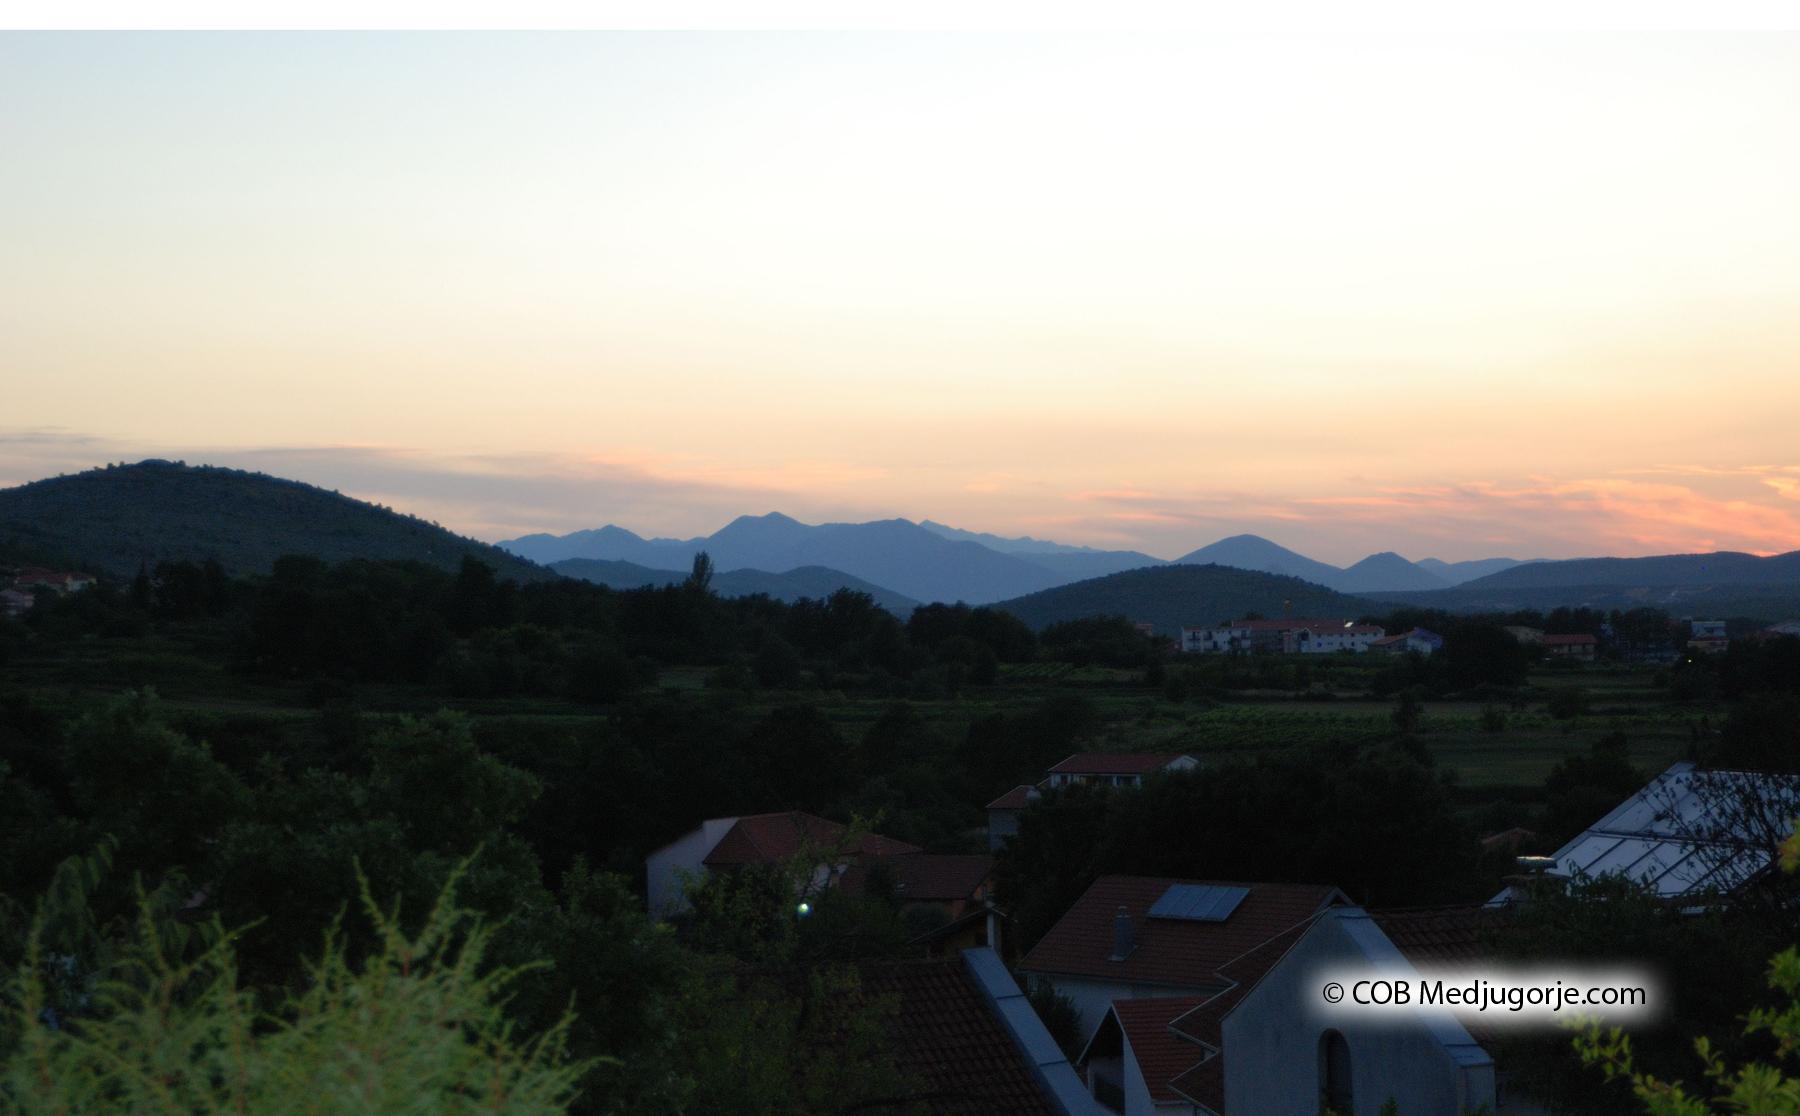 Sunset in Medjugorje